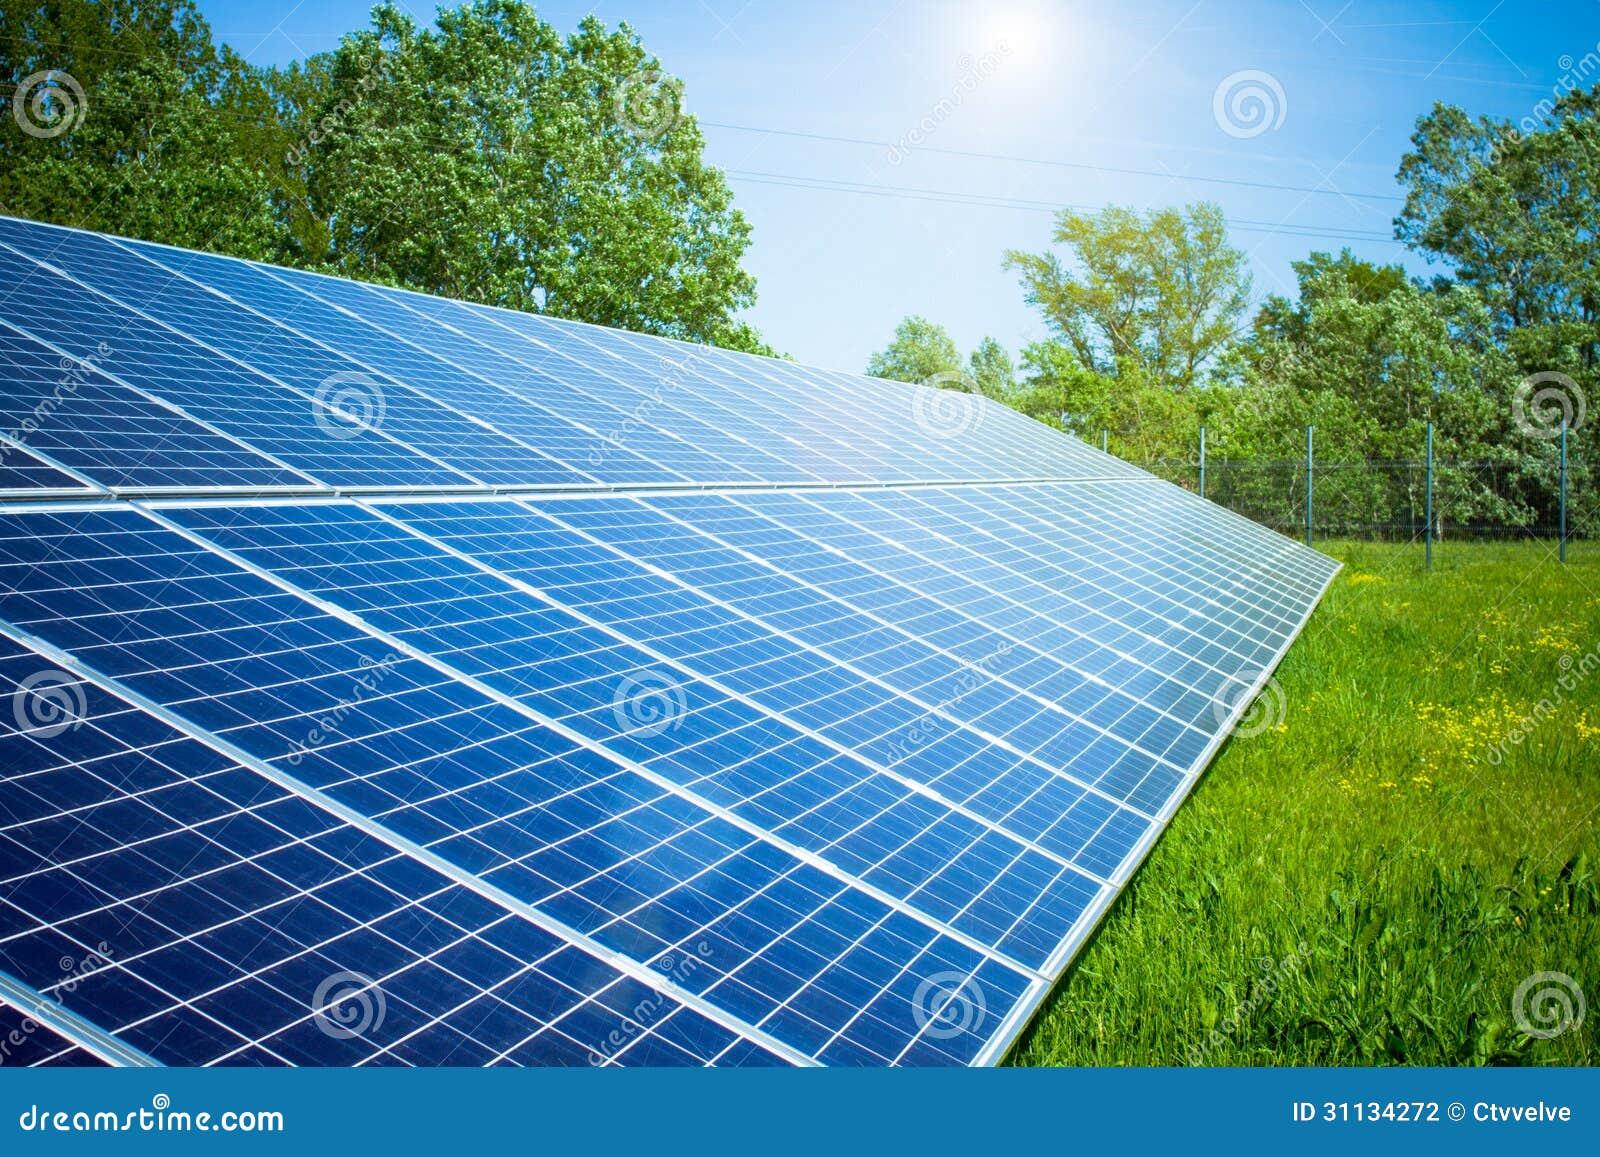 solar panel stock photography image 31134272